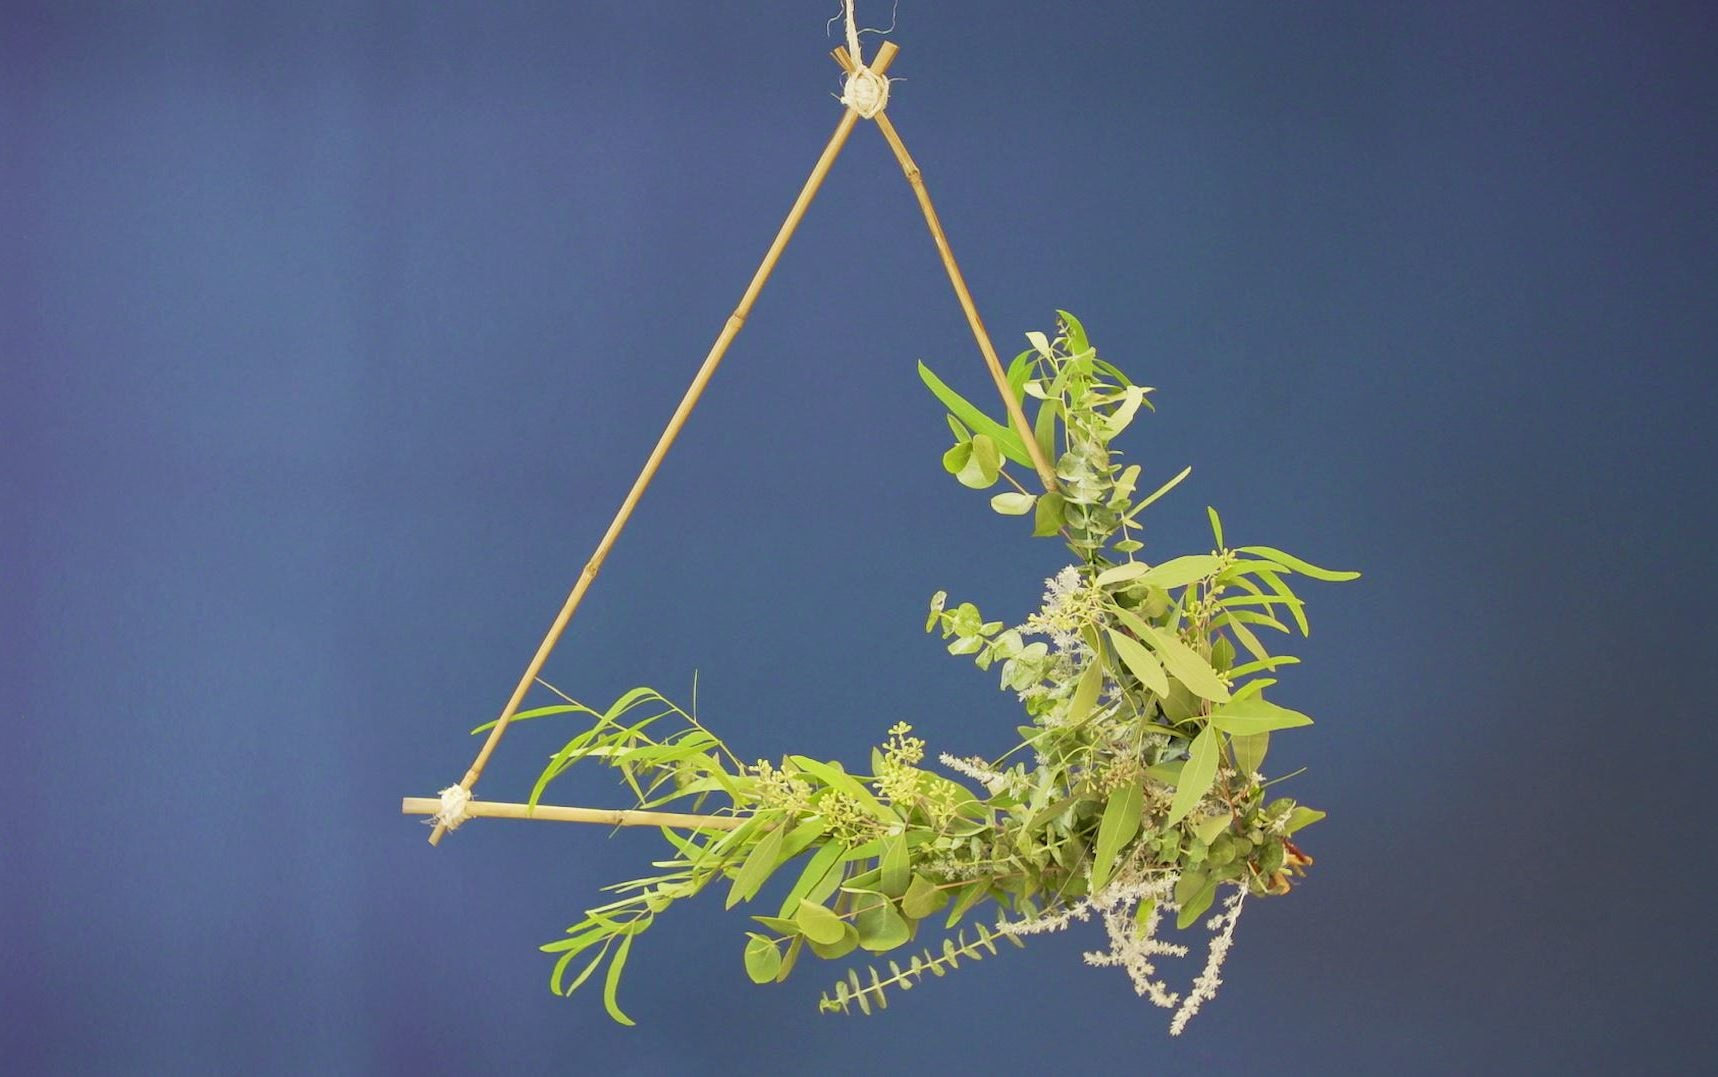 Eucalyptus driehoek